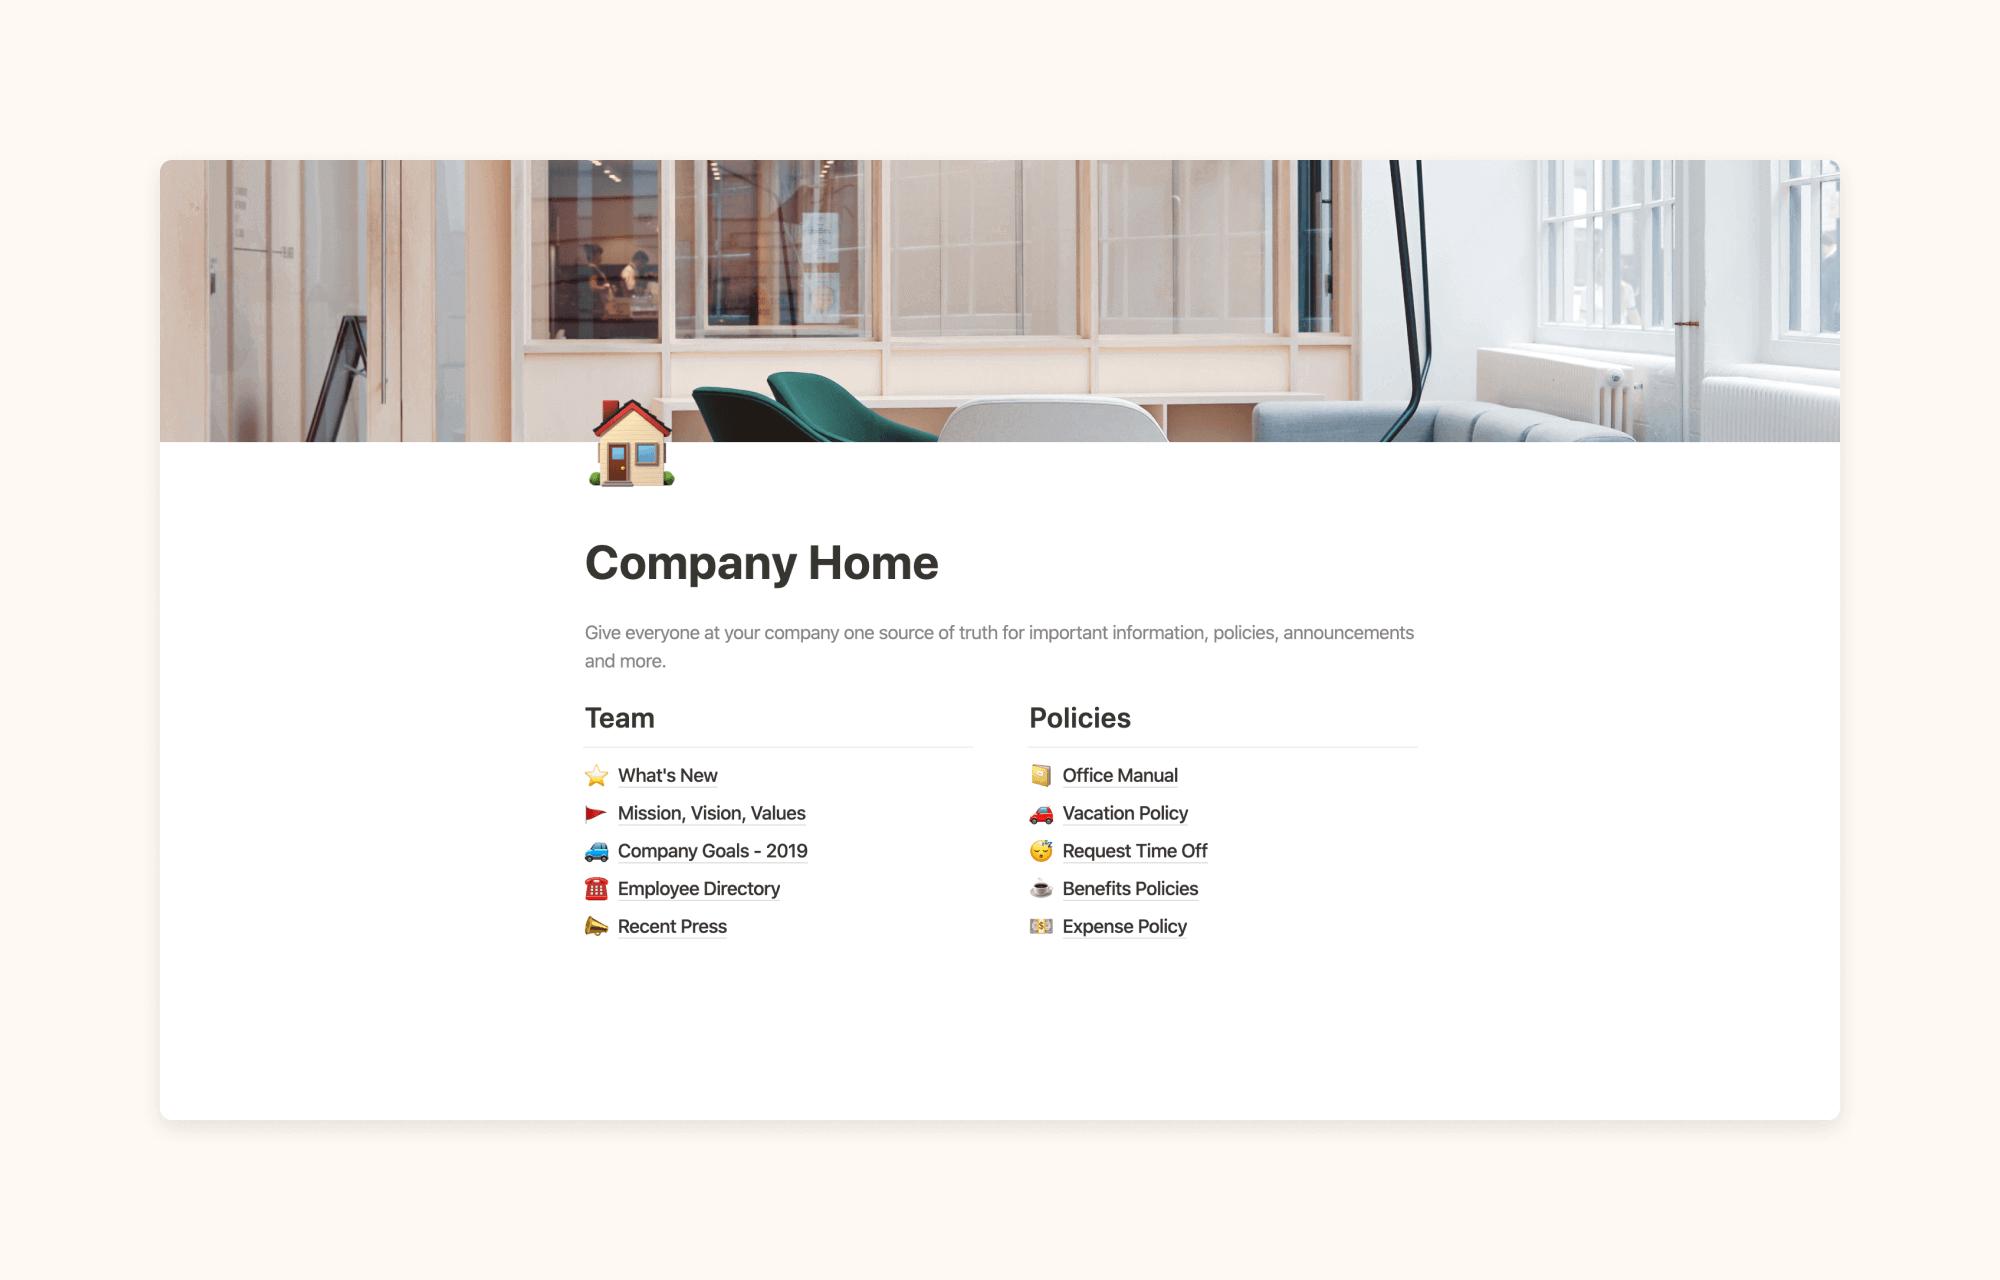 Company Home